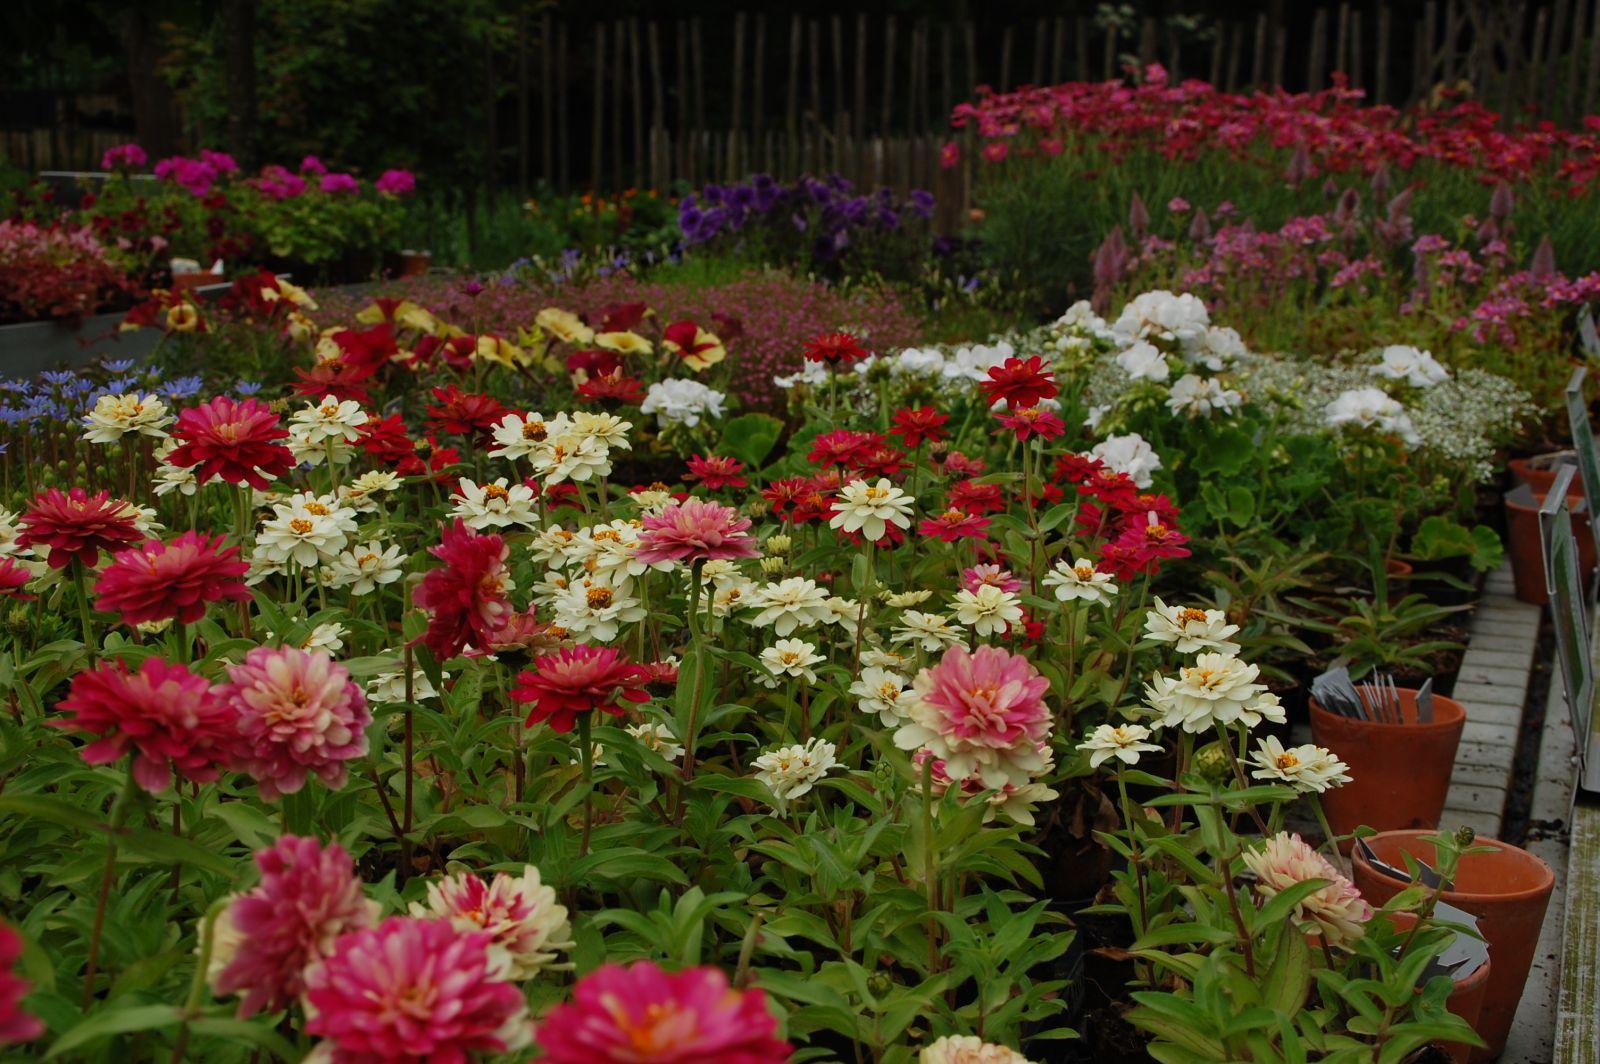 Fleurs mois de juillet id e inspirante pour for Alarme maison castorama